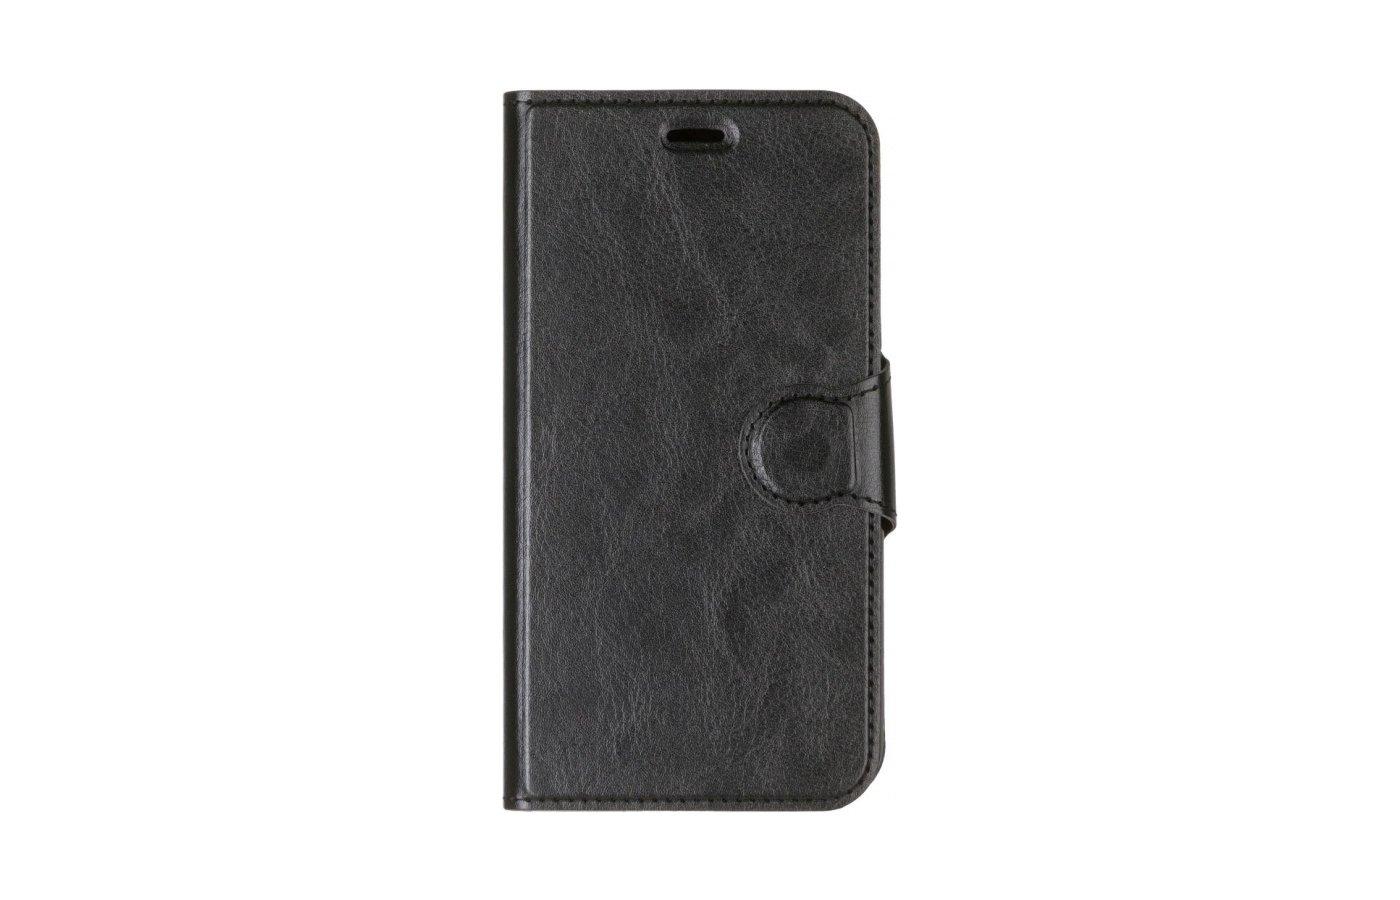 Чехол Red Line Book Type для Samsung Galaxy J3 (2016) SM-J320 черный